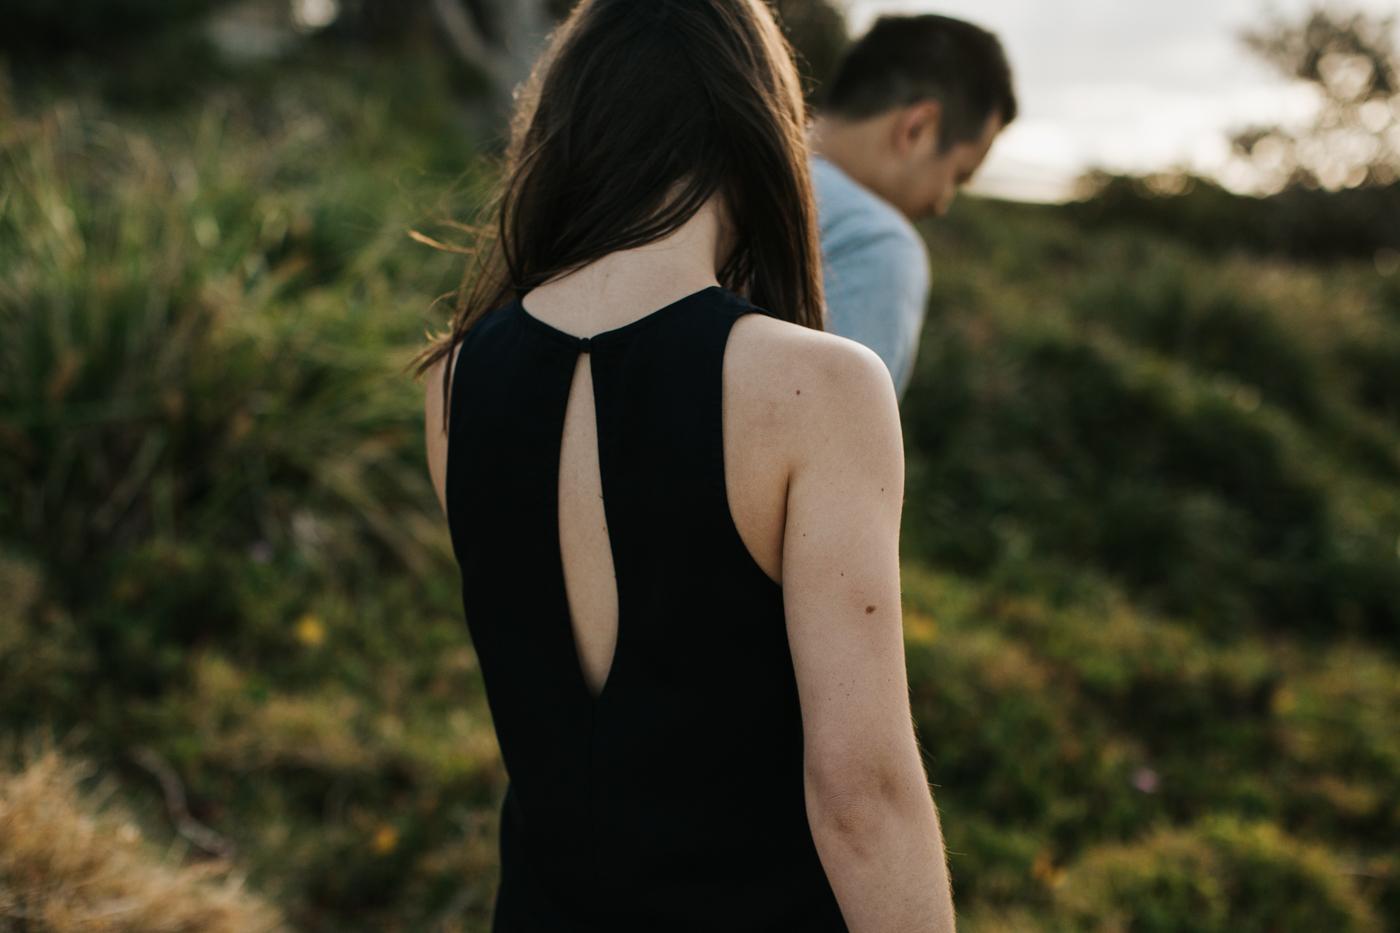 James & Caitie Engagement - Watsons Bay - Samantha Heather Photography-16.jpg